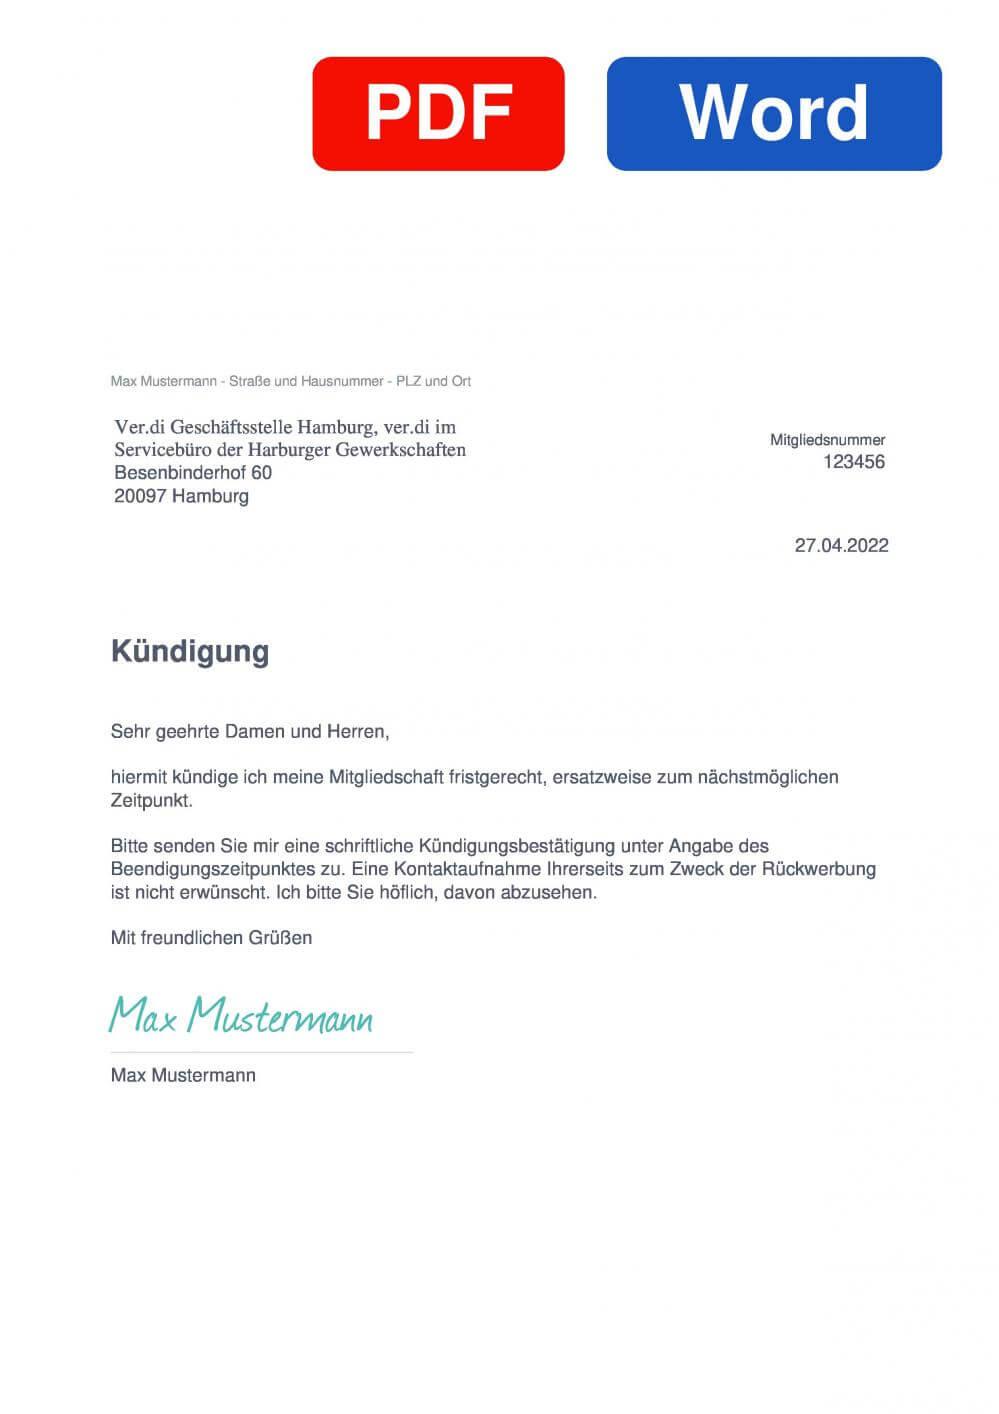 Verdi Hamburg, ver.di im Servicebüro der Harburger